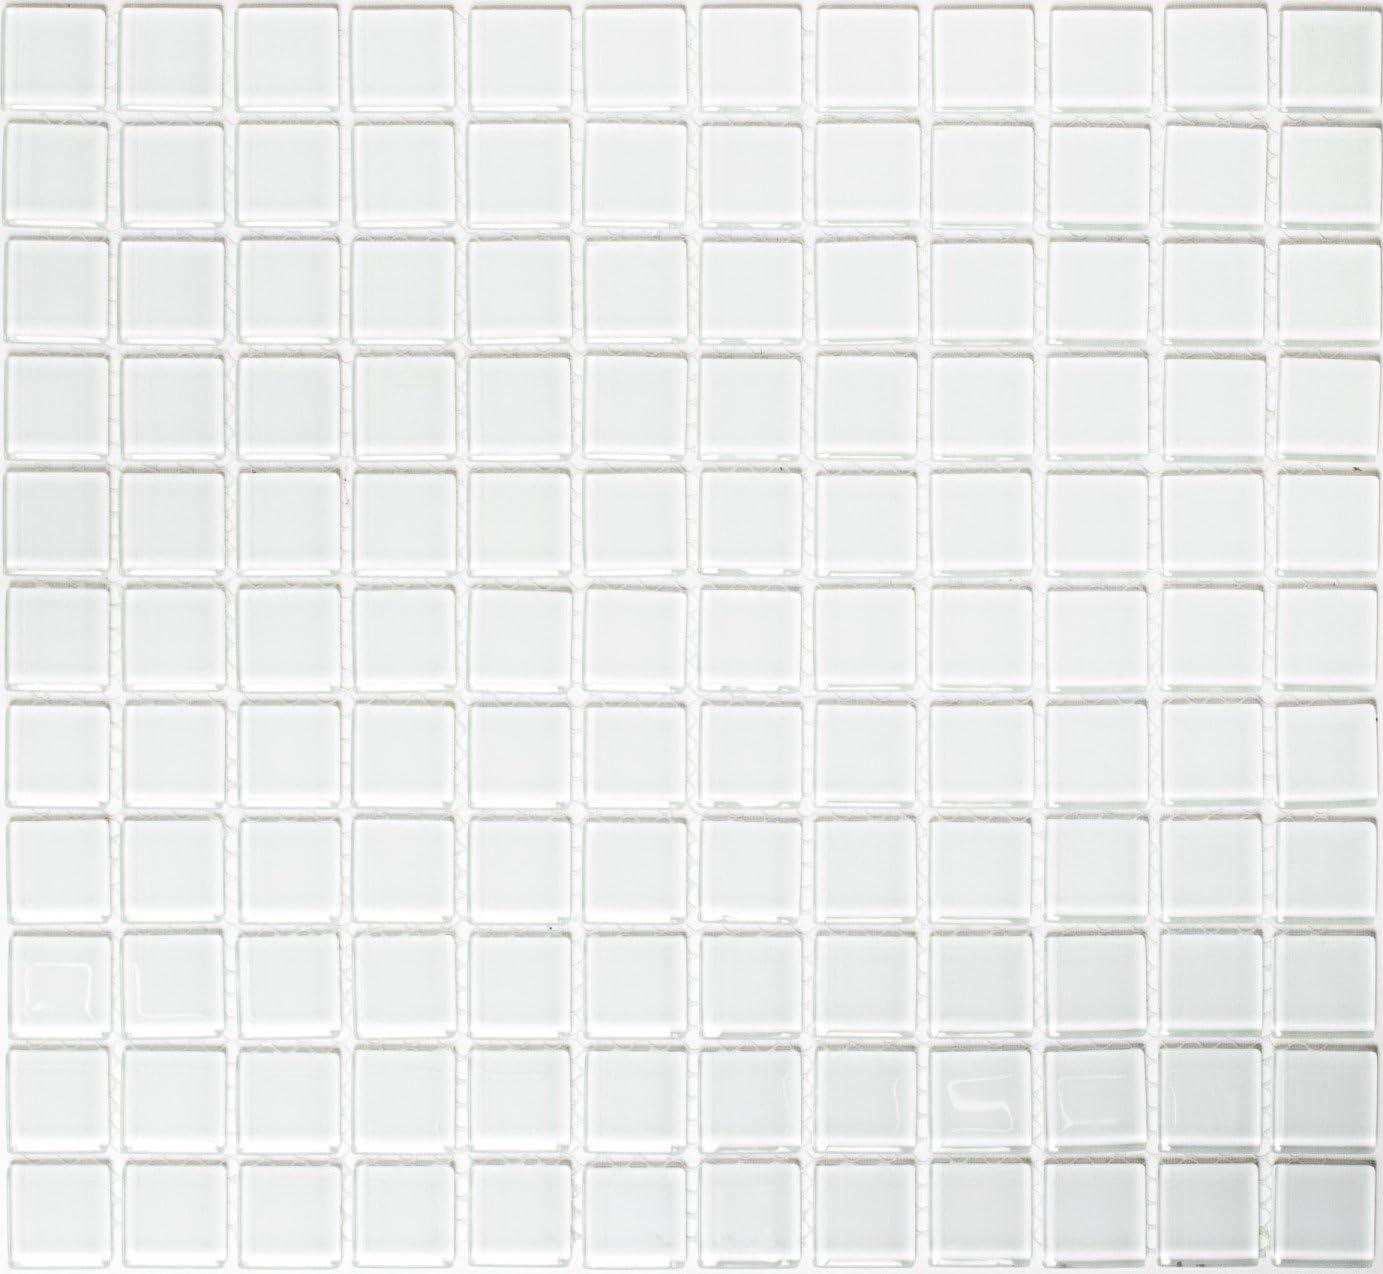 Mosaic Tiles Crystal Transparent Plain White